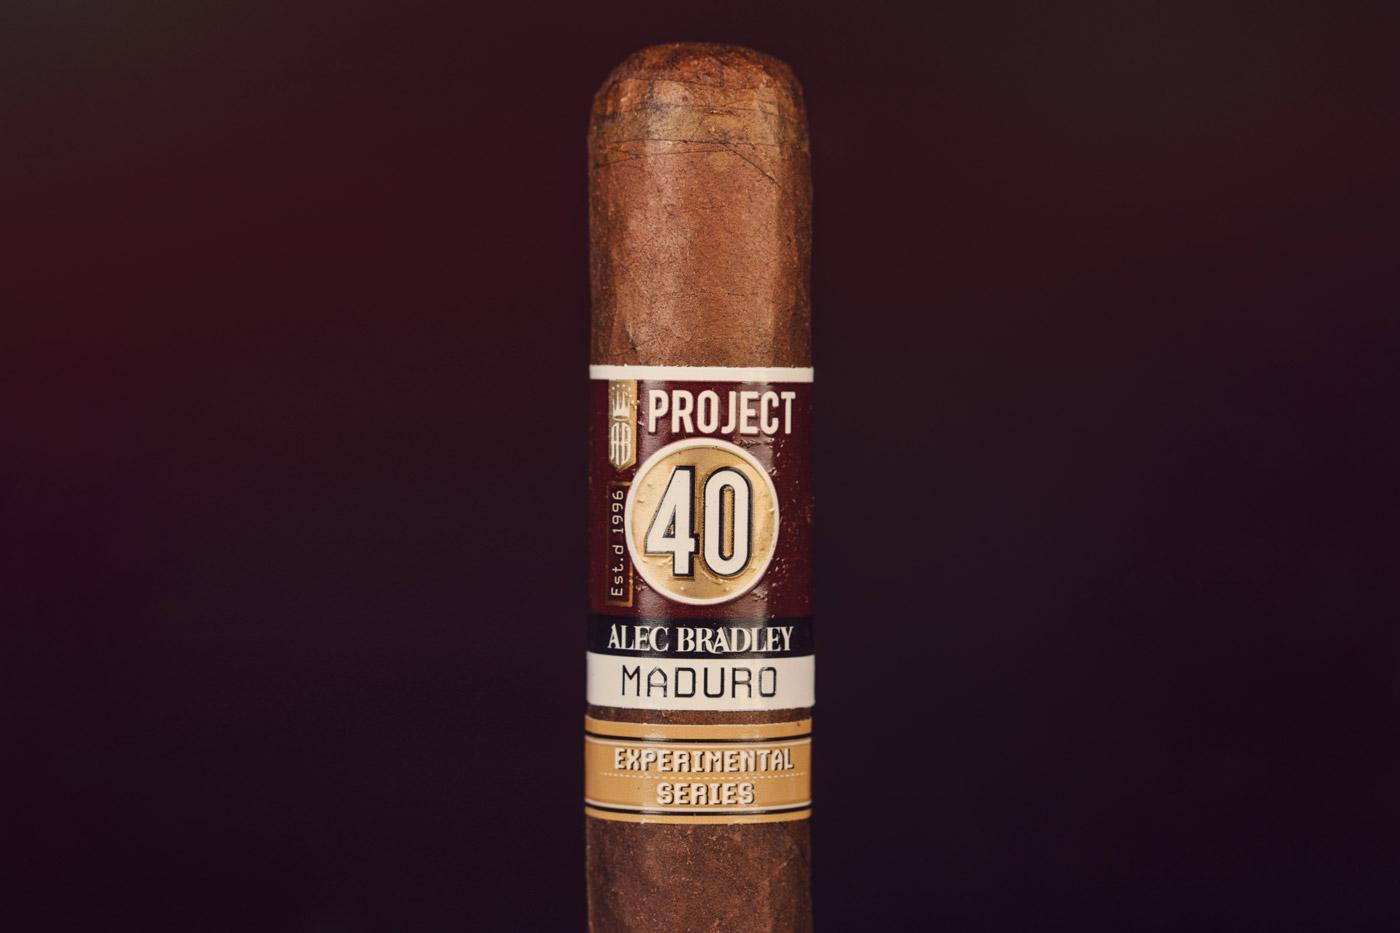 Alec Bradley Project 40 Maduro 05.50 cigar review